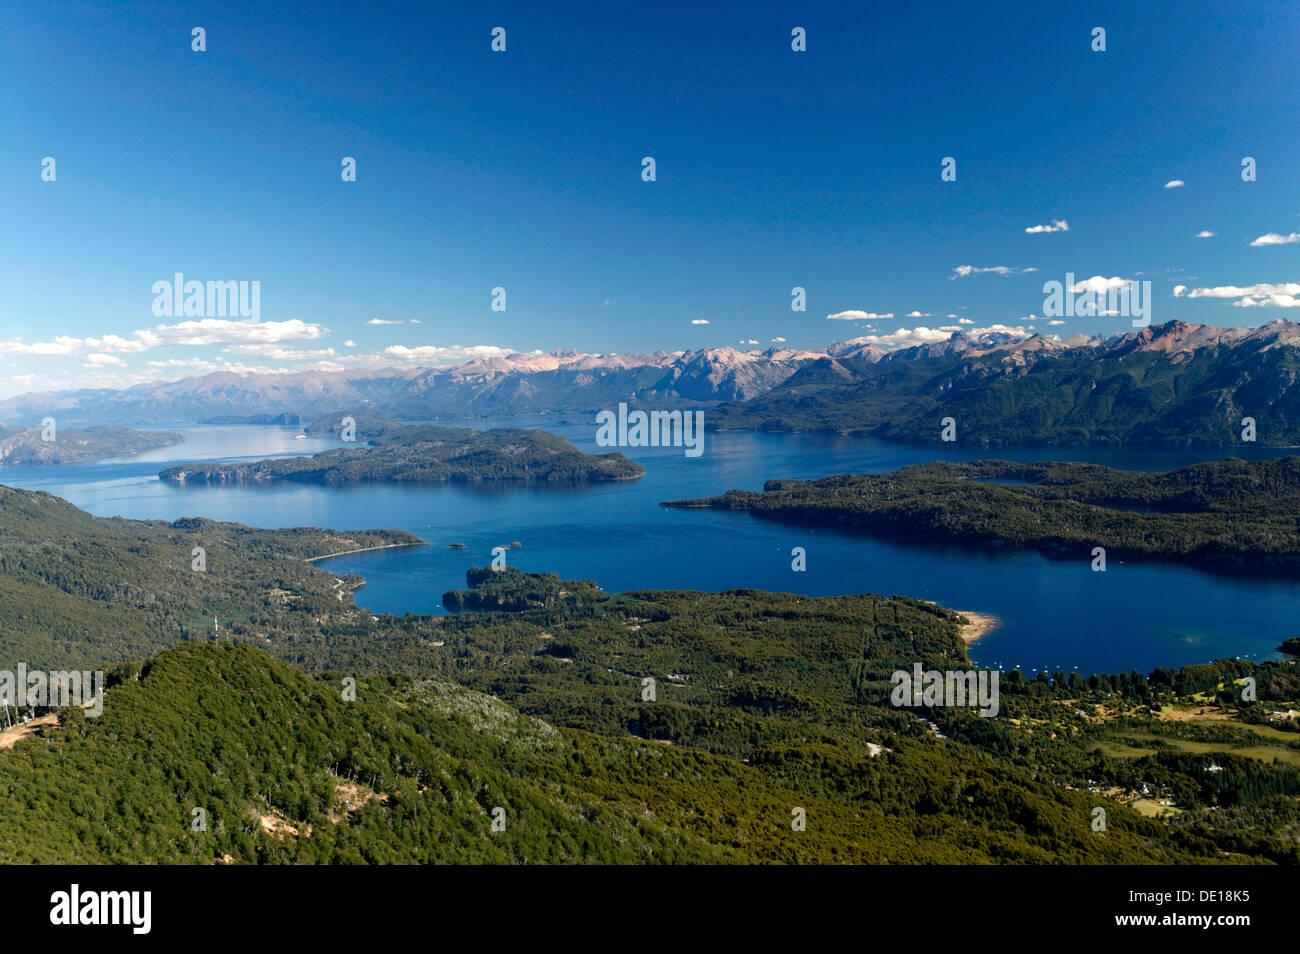 Lake Nahuel Huapi, Nahuel Huapi National Park, lake region of northern Patagonia, Argentina, South America - Stock Image